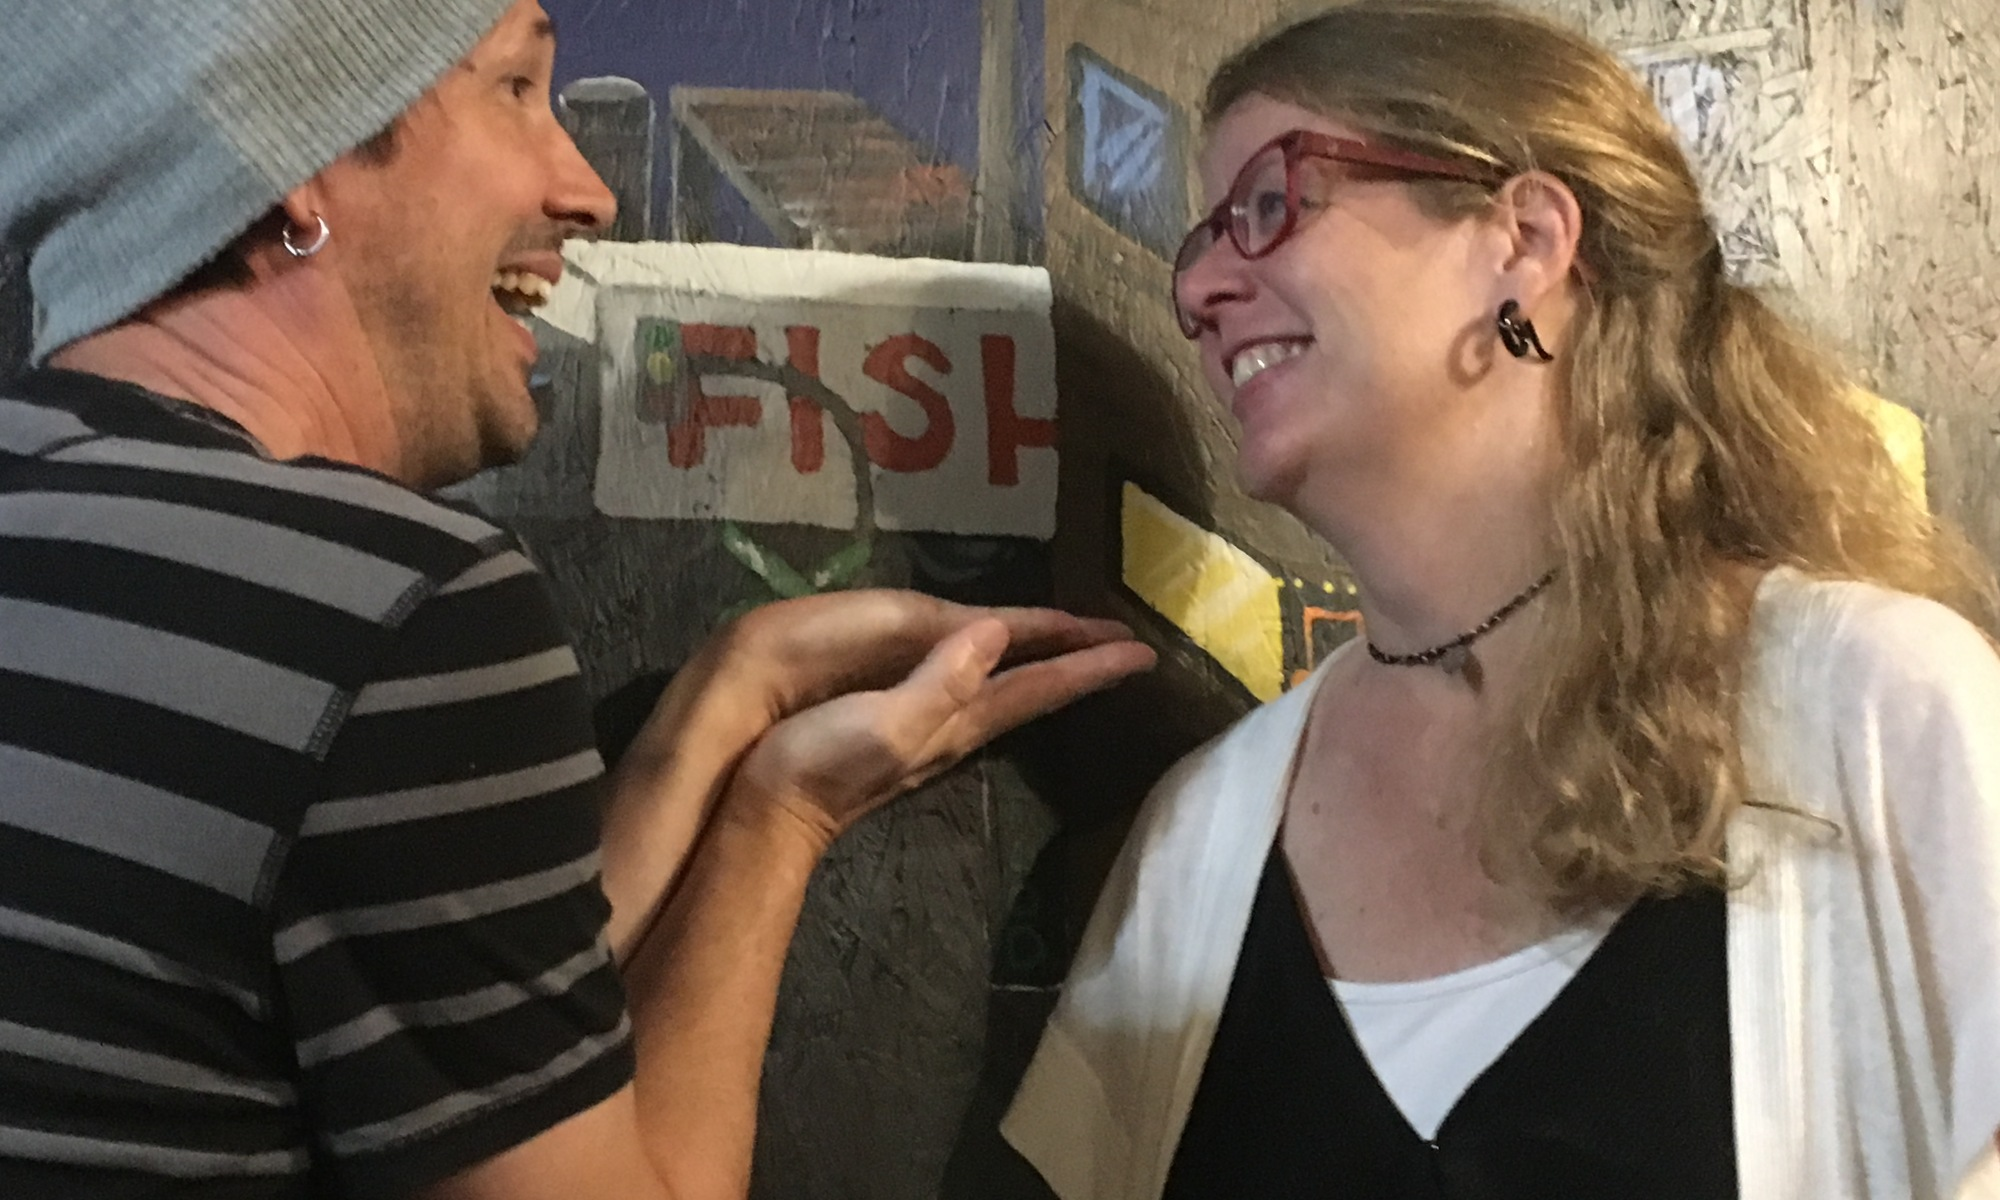 richard-amy-fish-ywam-tyler-missionary